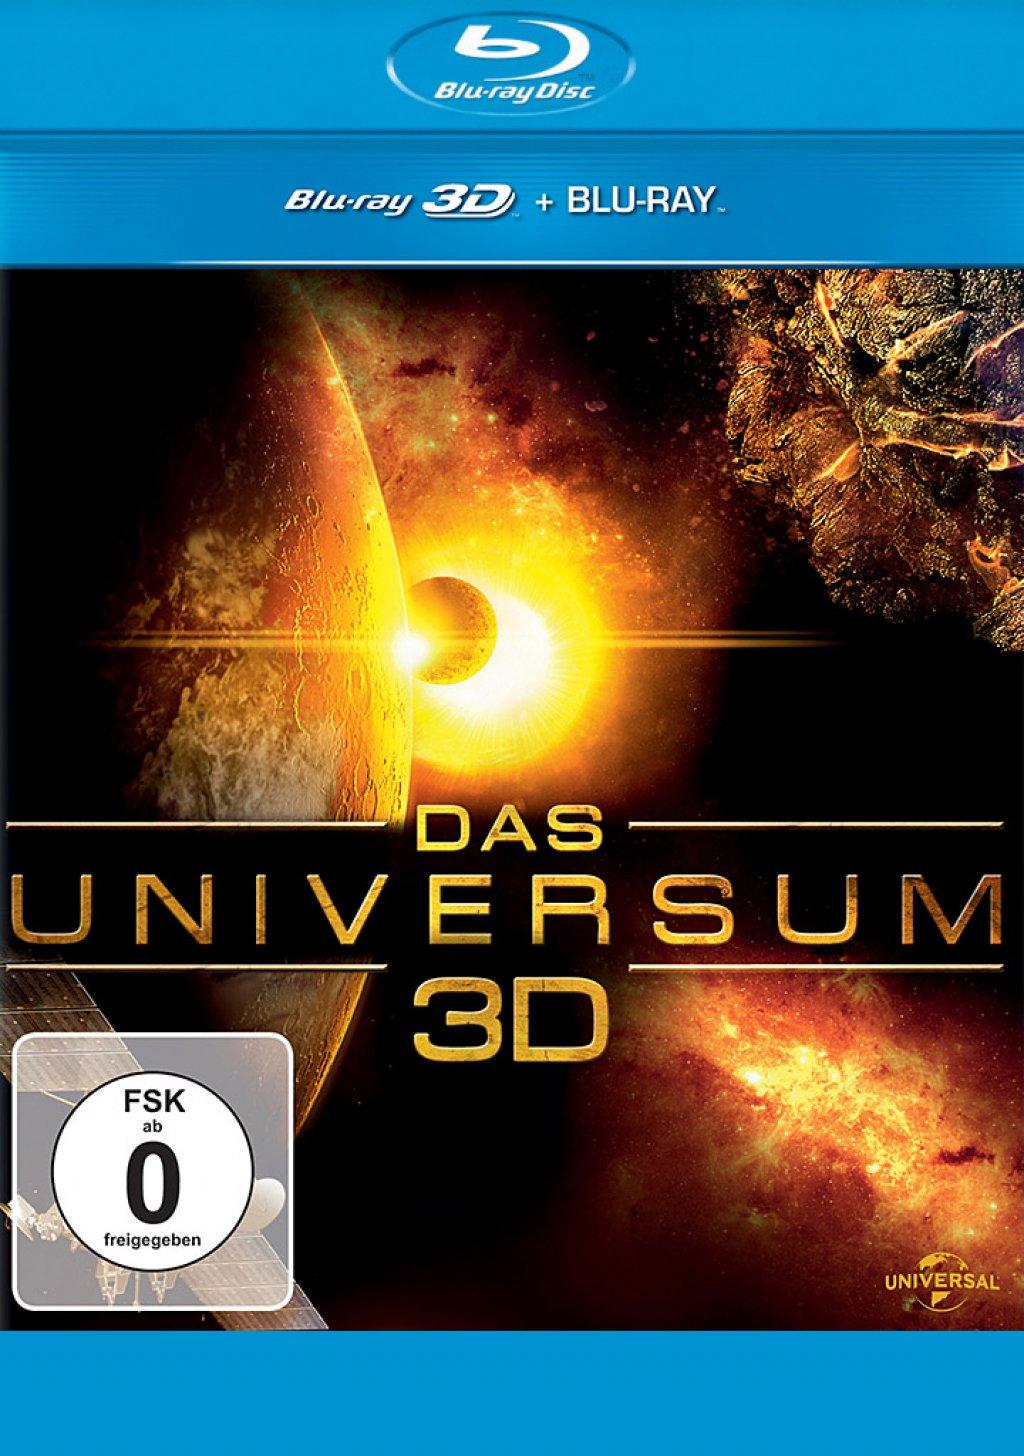 Das Universum 3D - Blu-ray 3D + 2D (Blu-ray)